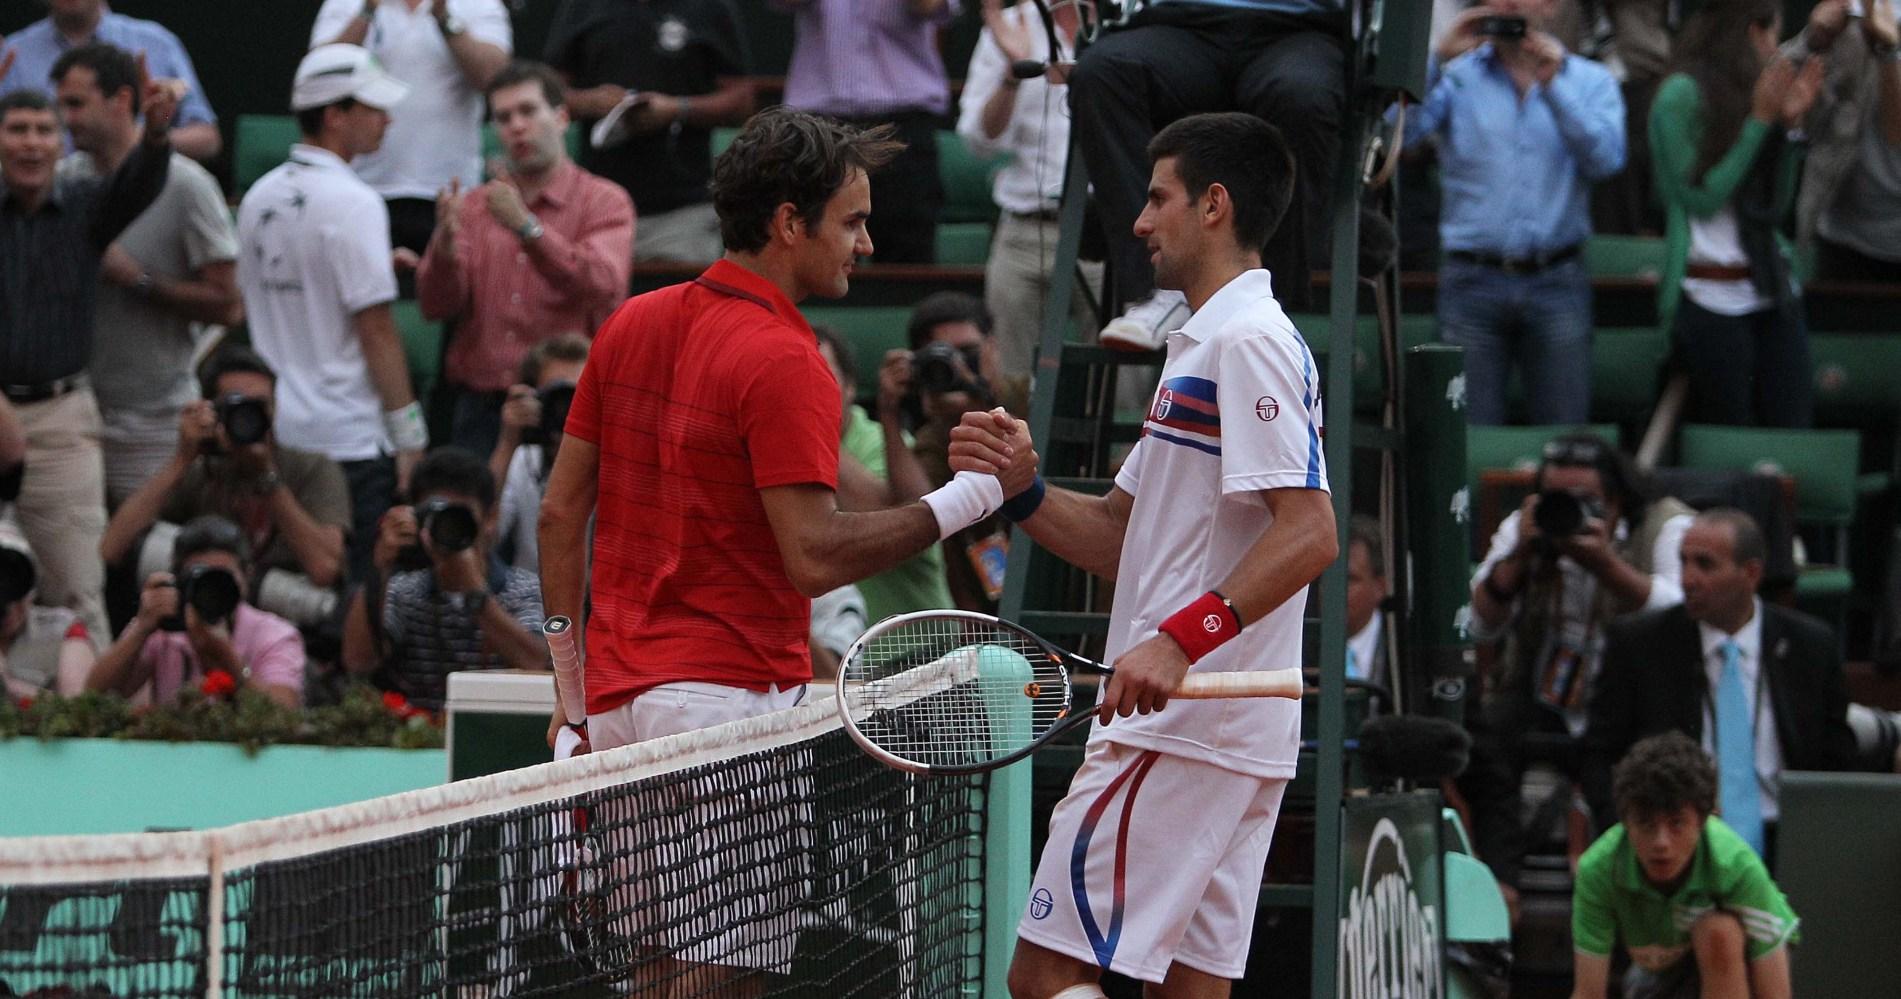 Roger Federer and Novak Djokovic shake hands after their 2011 semi-final in Paris.